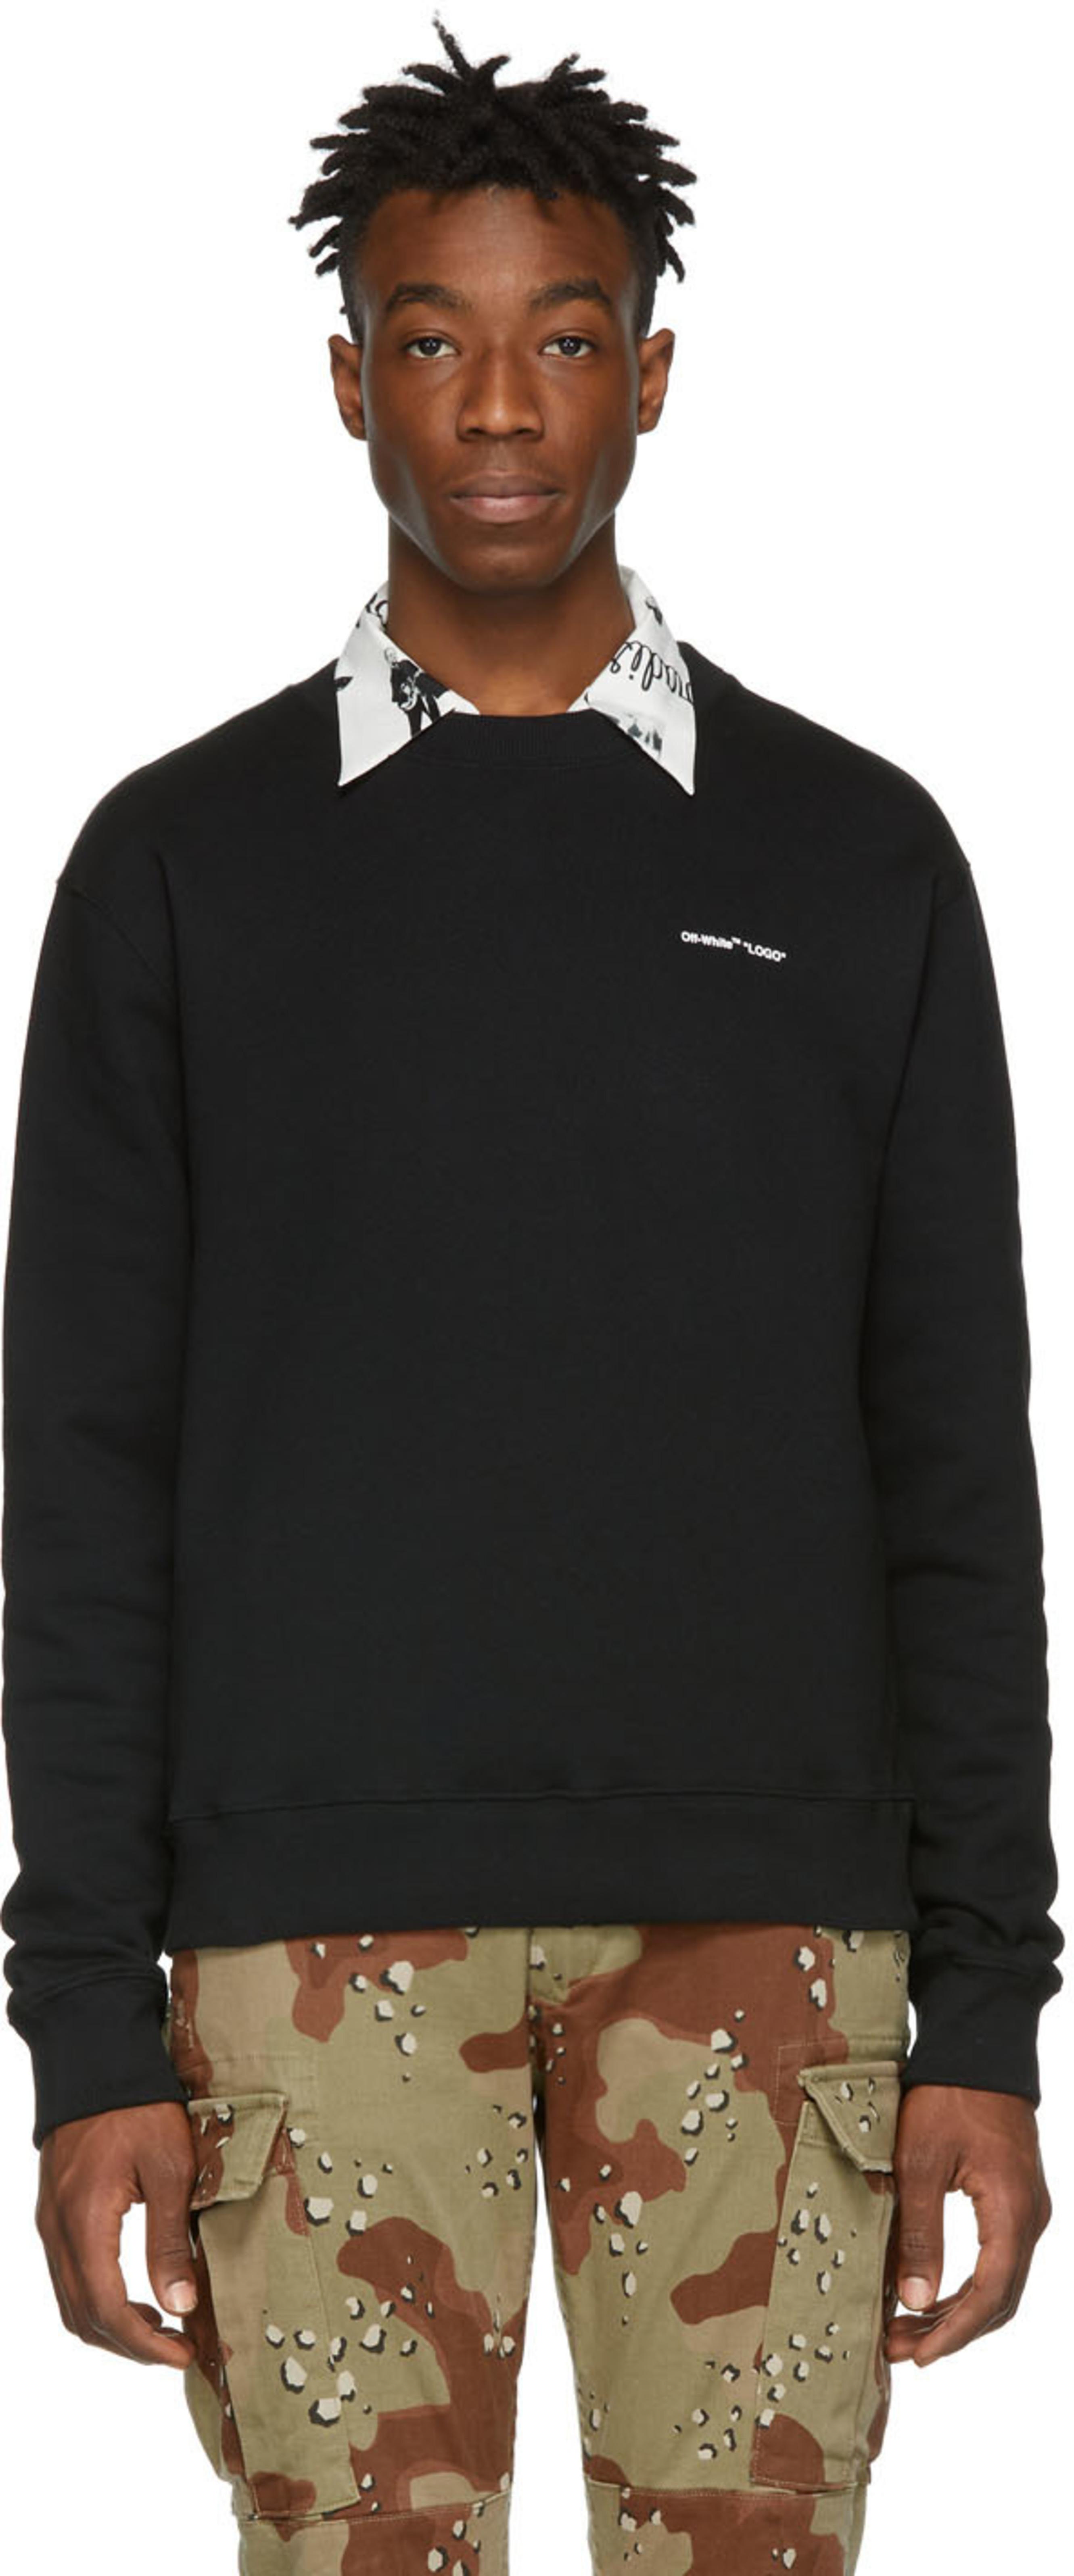 549f121fdd8a Off-white clothing for Men